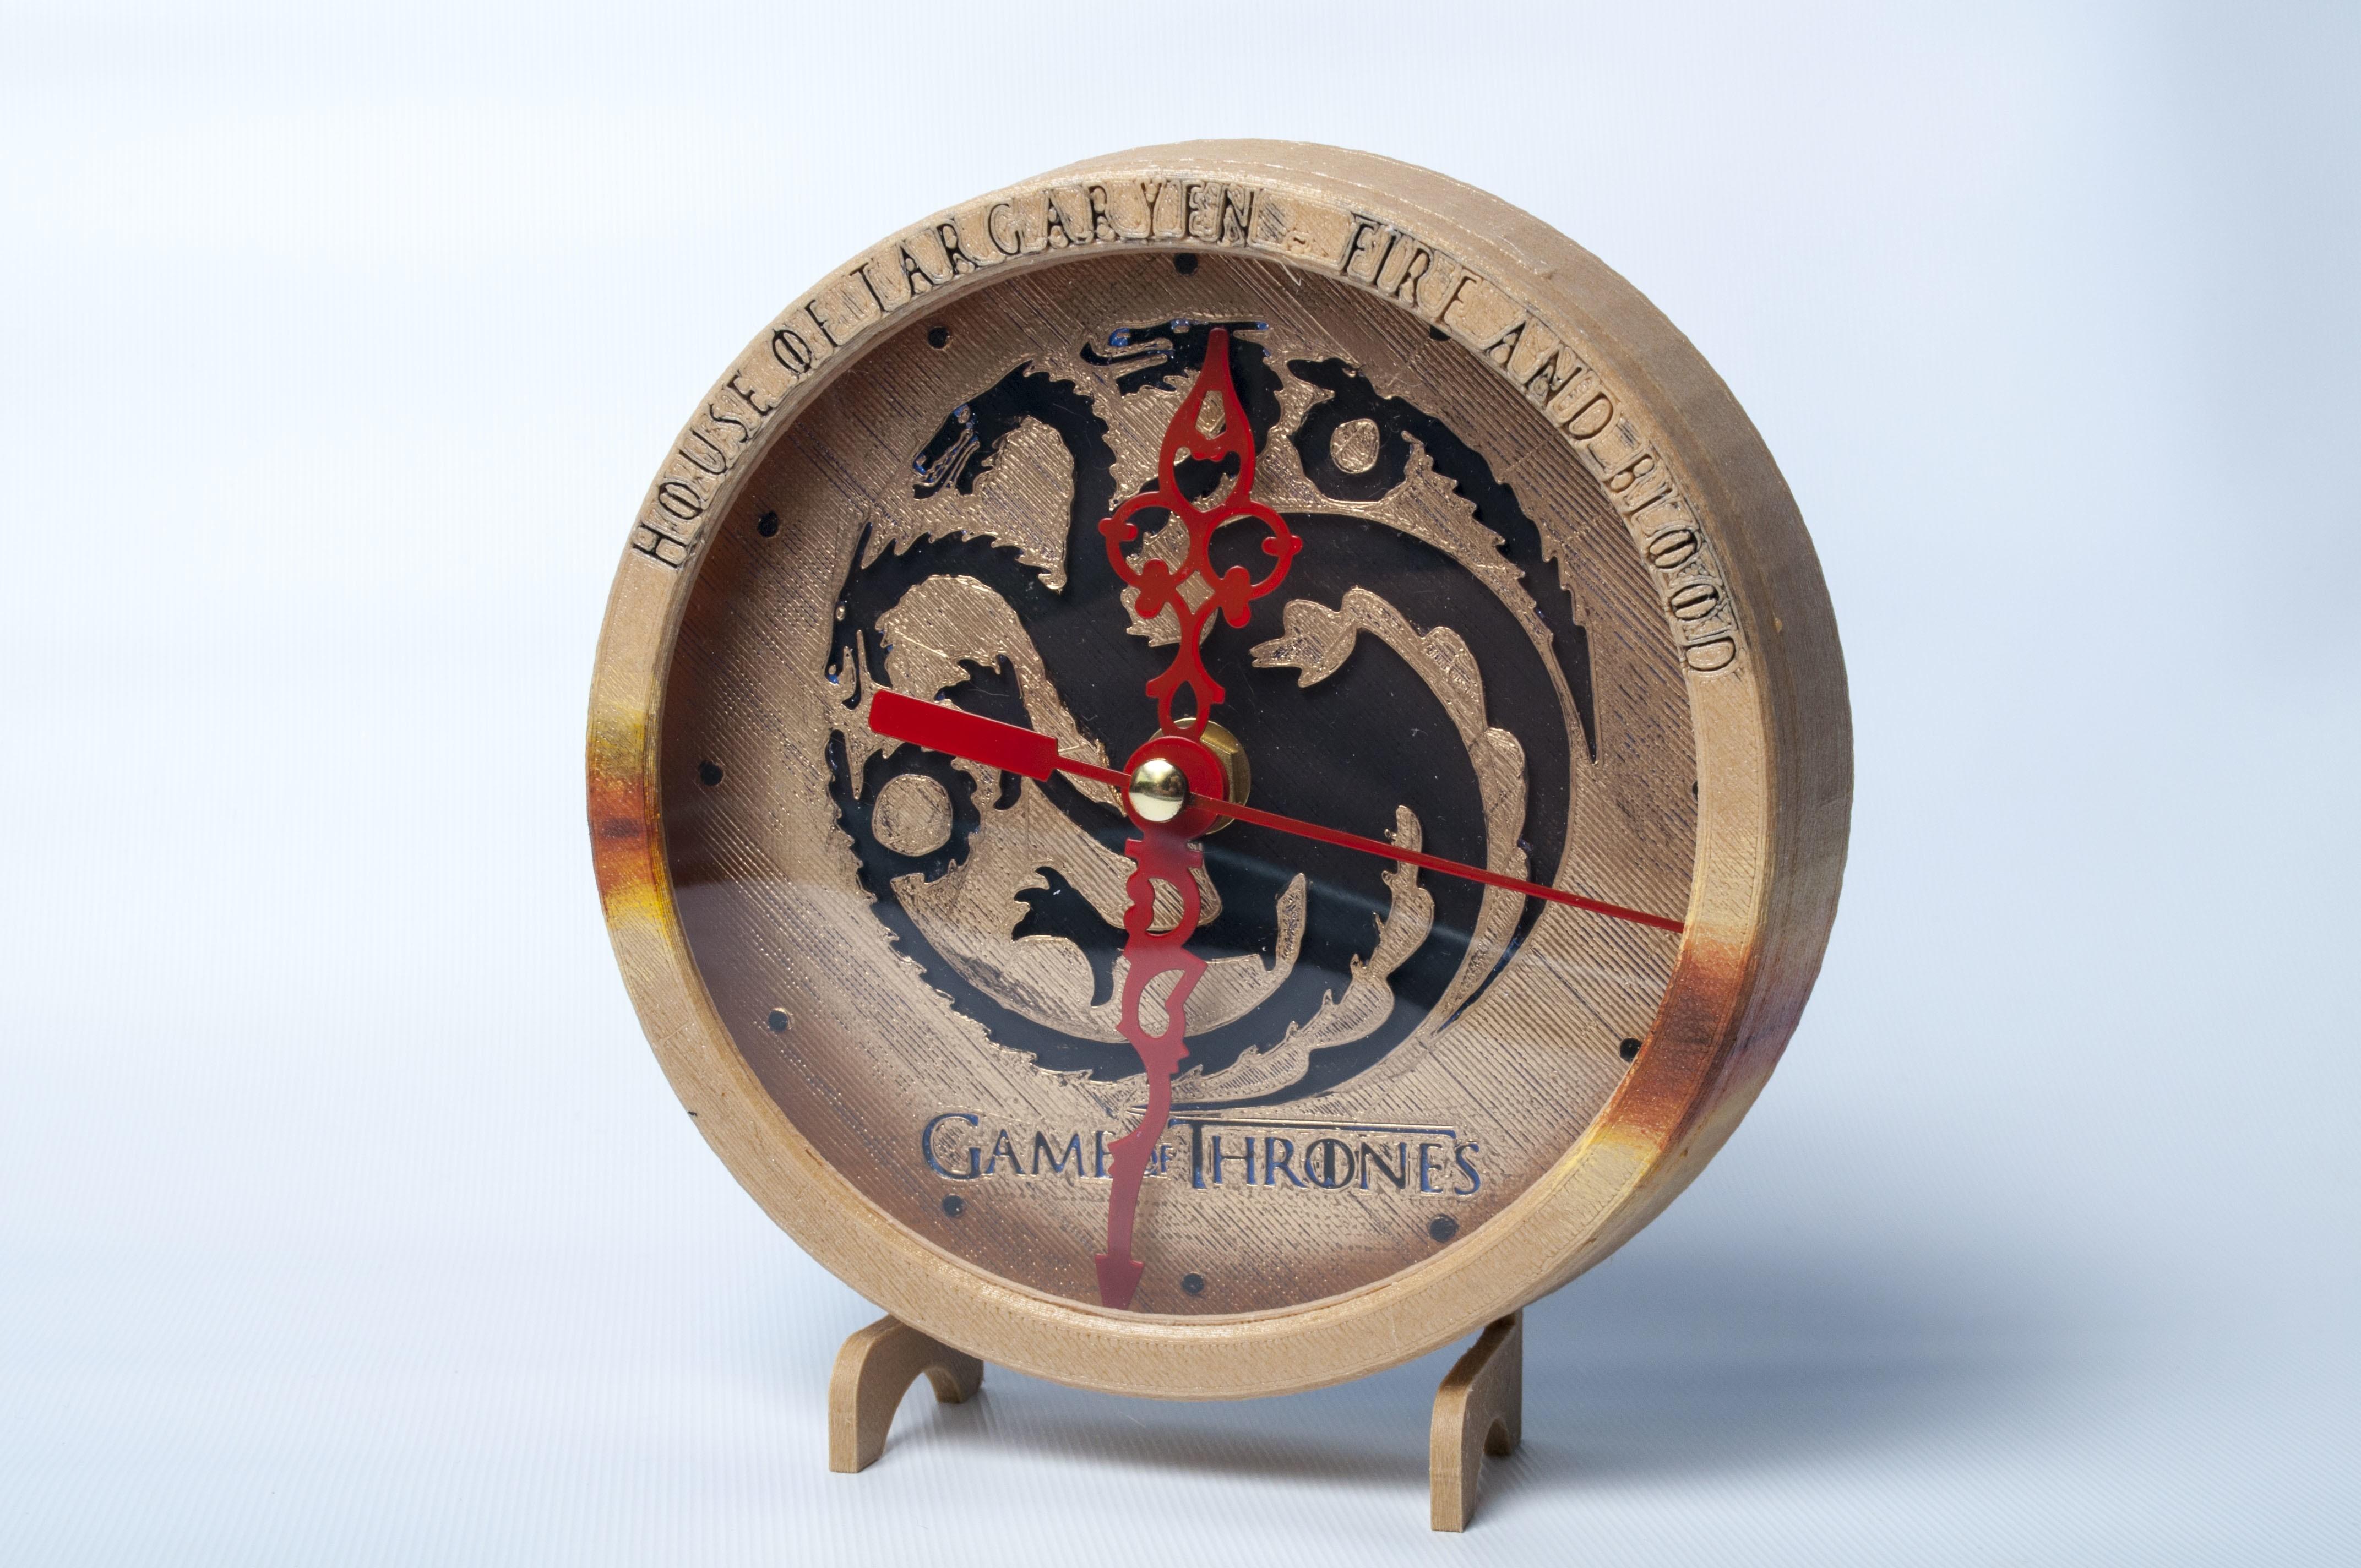 DSC_4185.jpg Download free STL file Game of Thrones Clock • 3D printable object, wjordan819